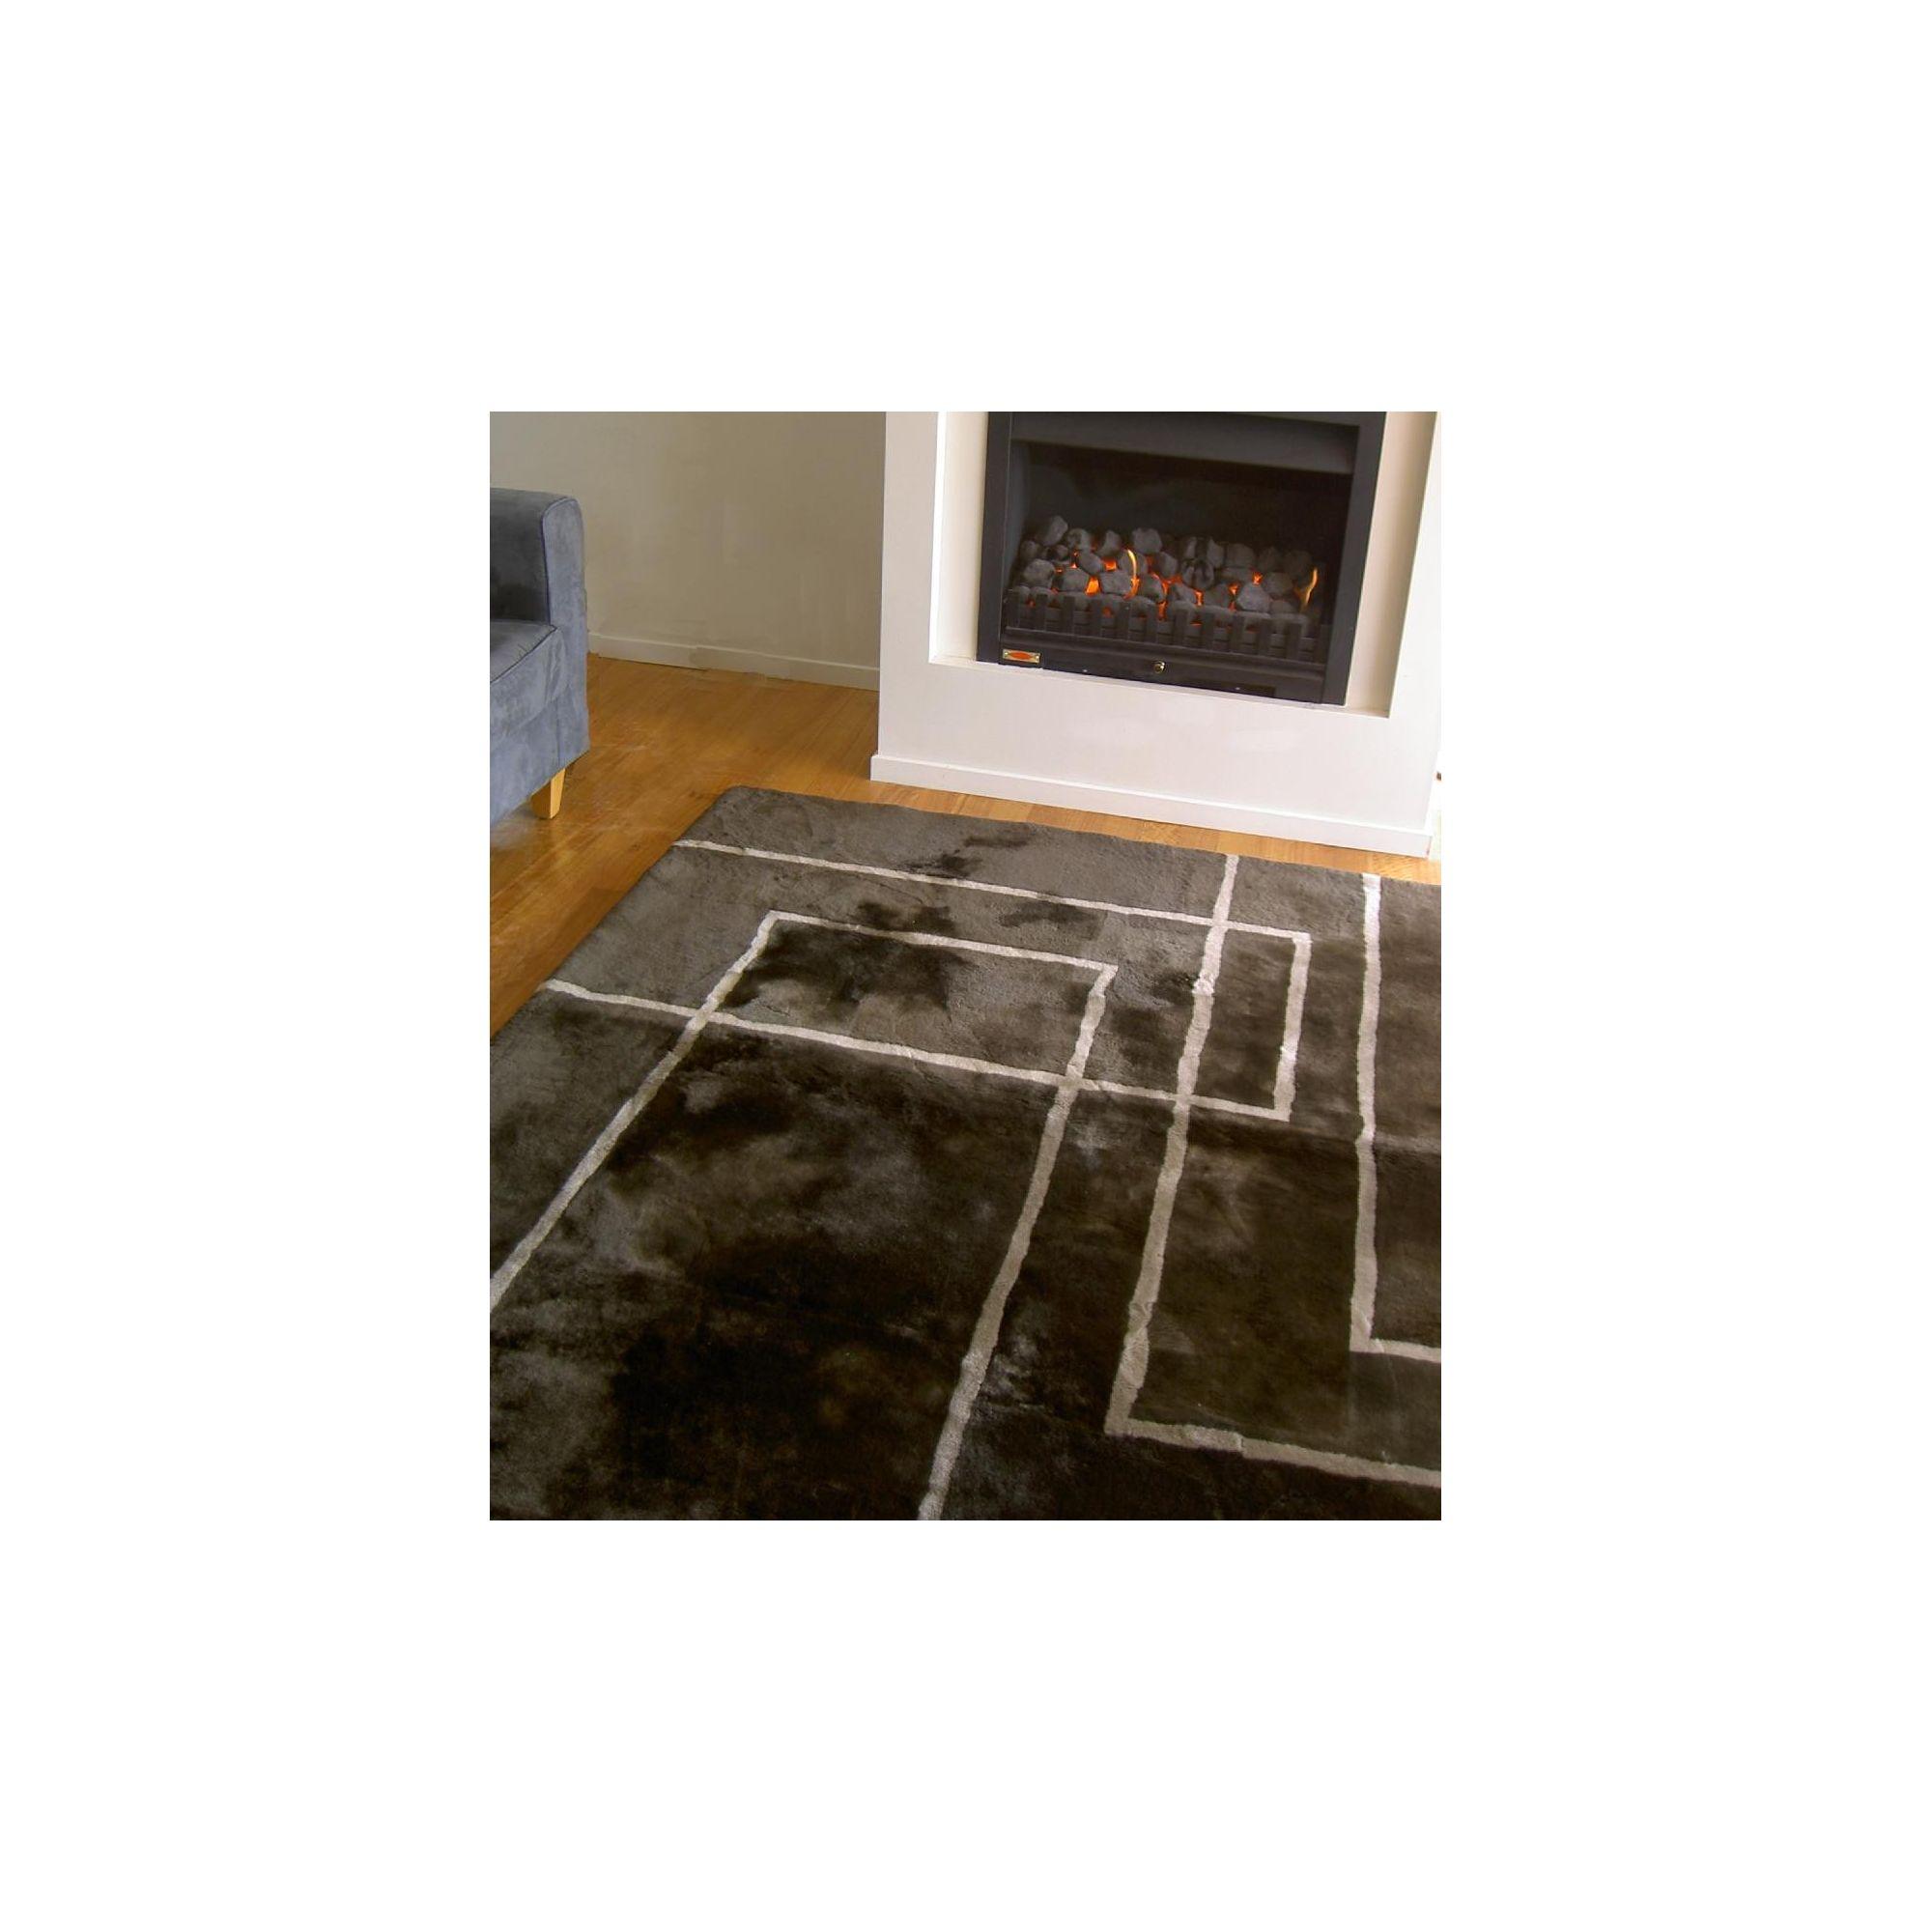 Bowron Sheepskin Shortwool Design Corners Rug - 180cm H x 120cm W x 1cm D at Tesco Direct